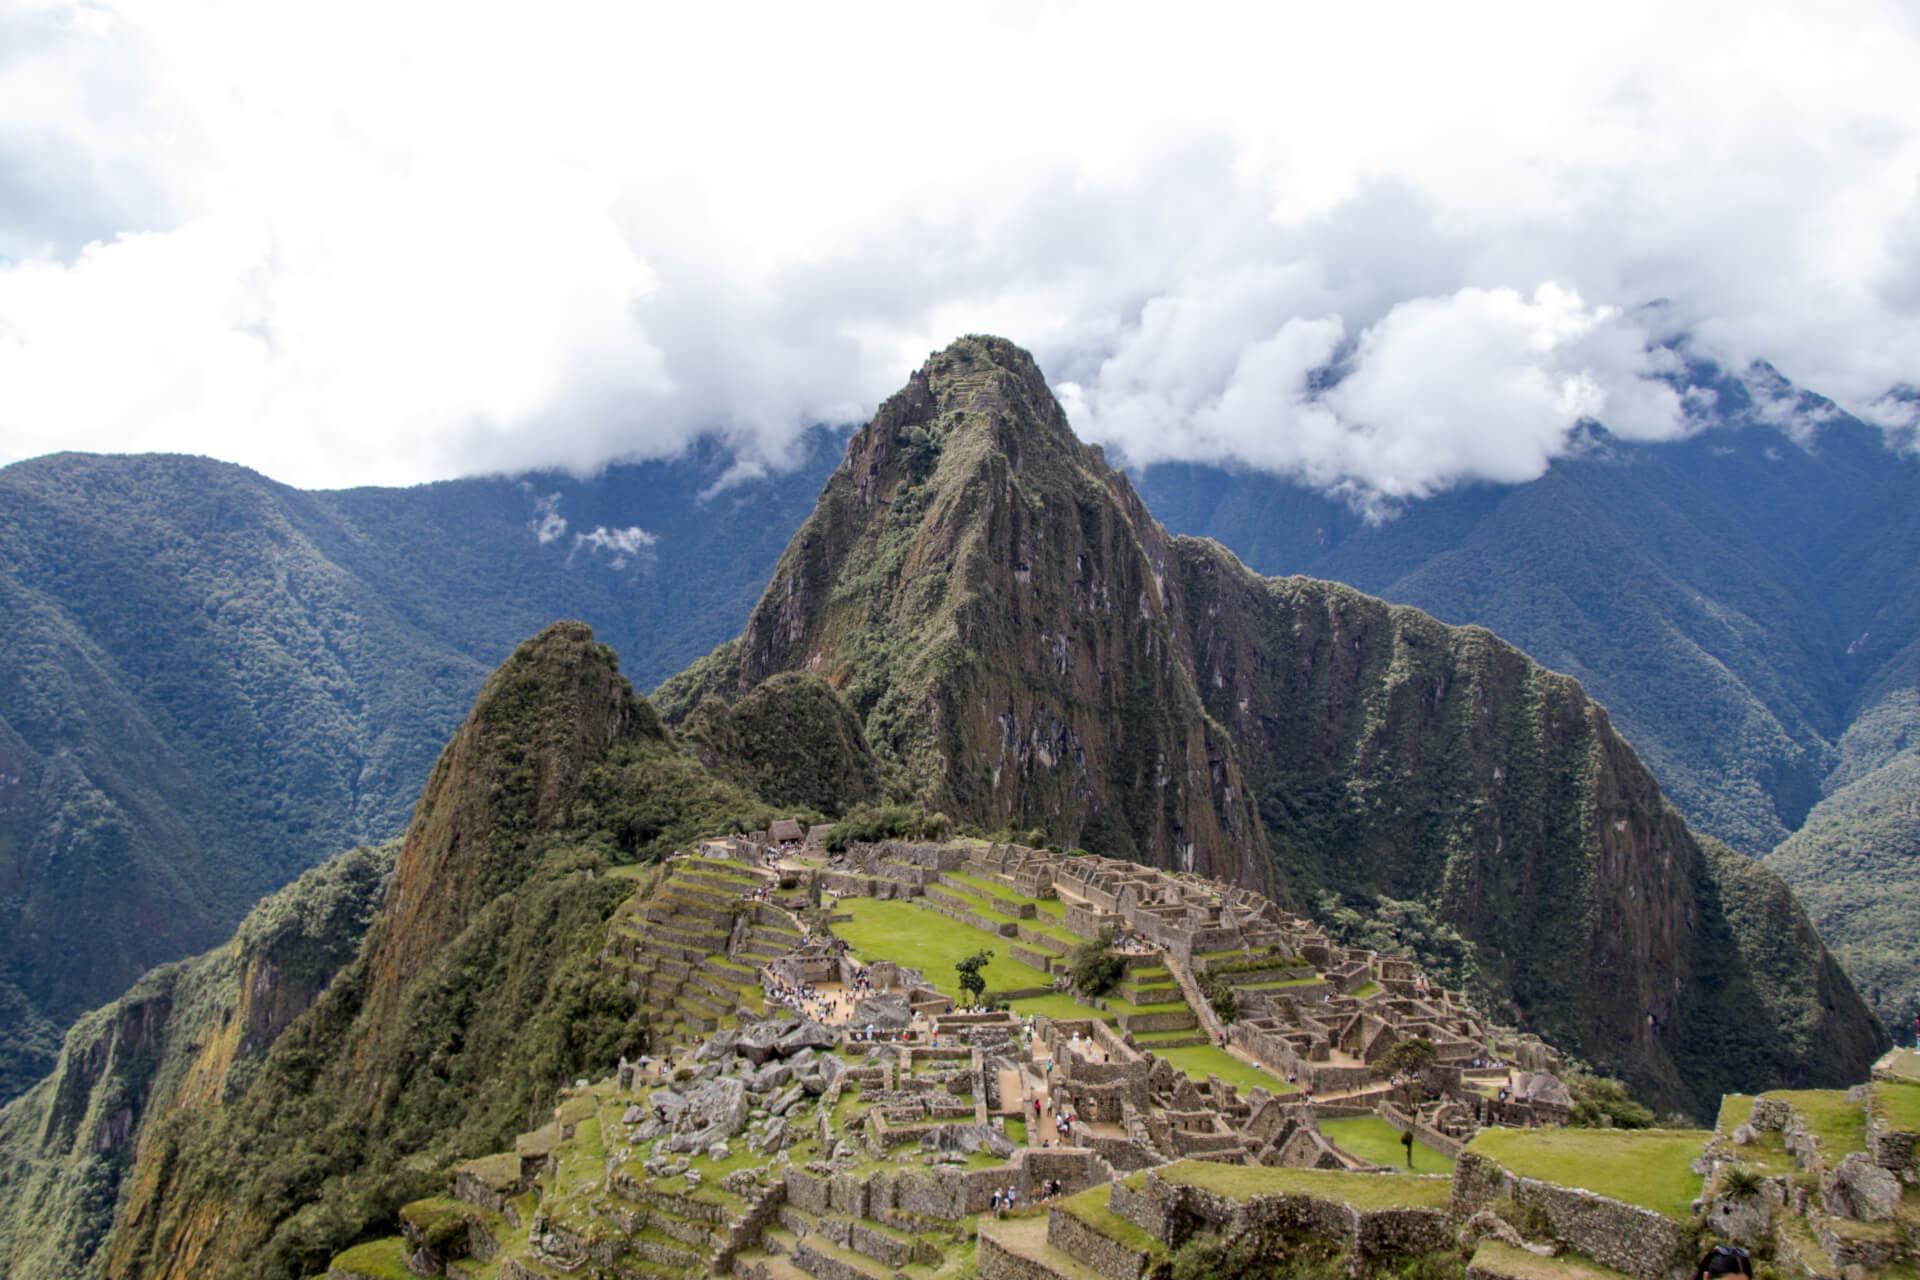 Aguas Calientes : Visite du Machu Picchu